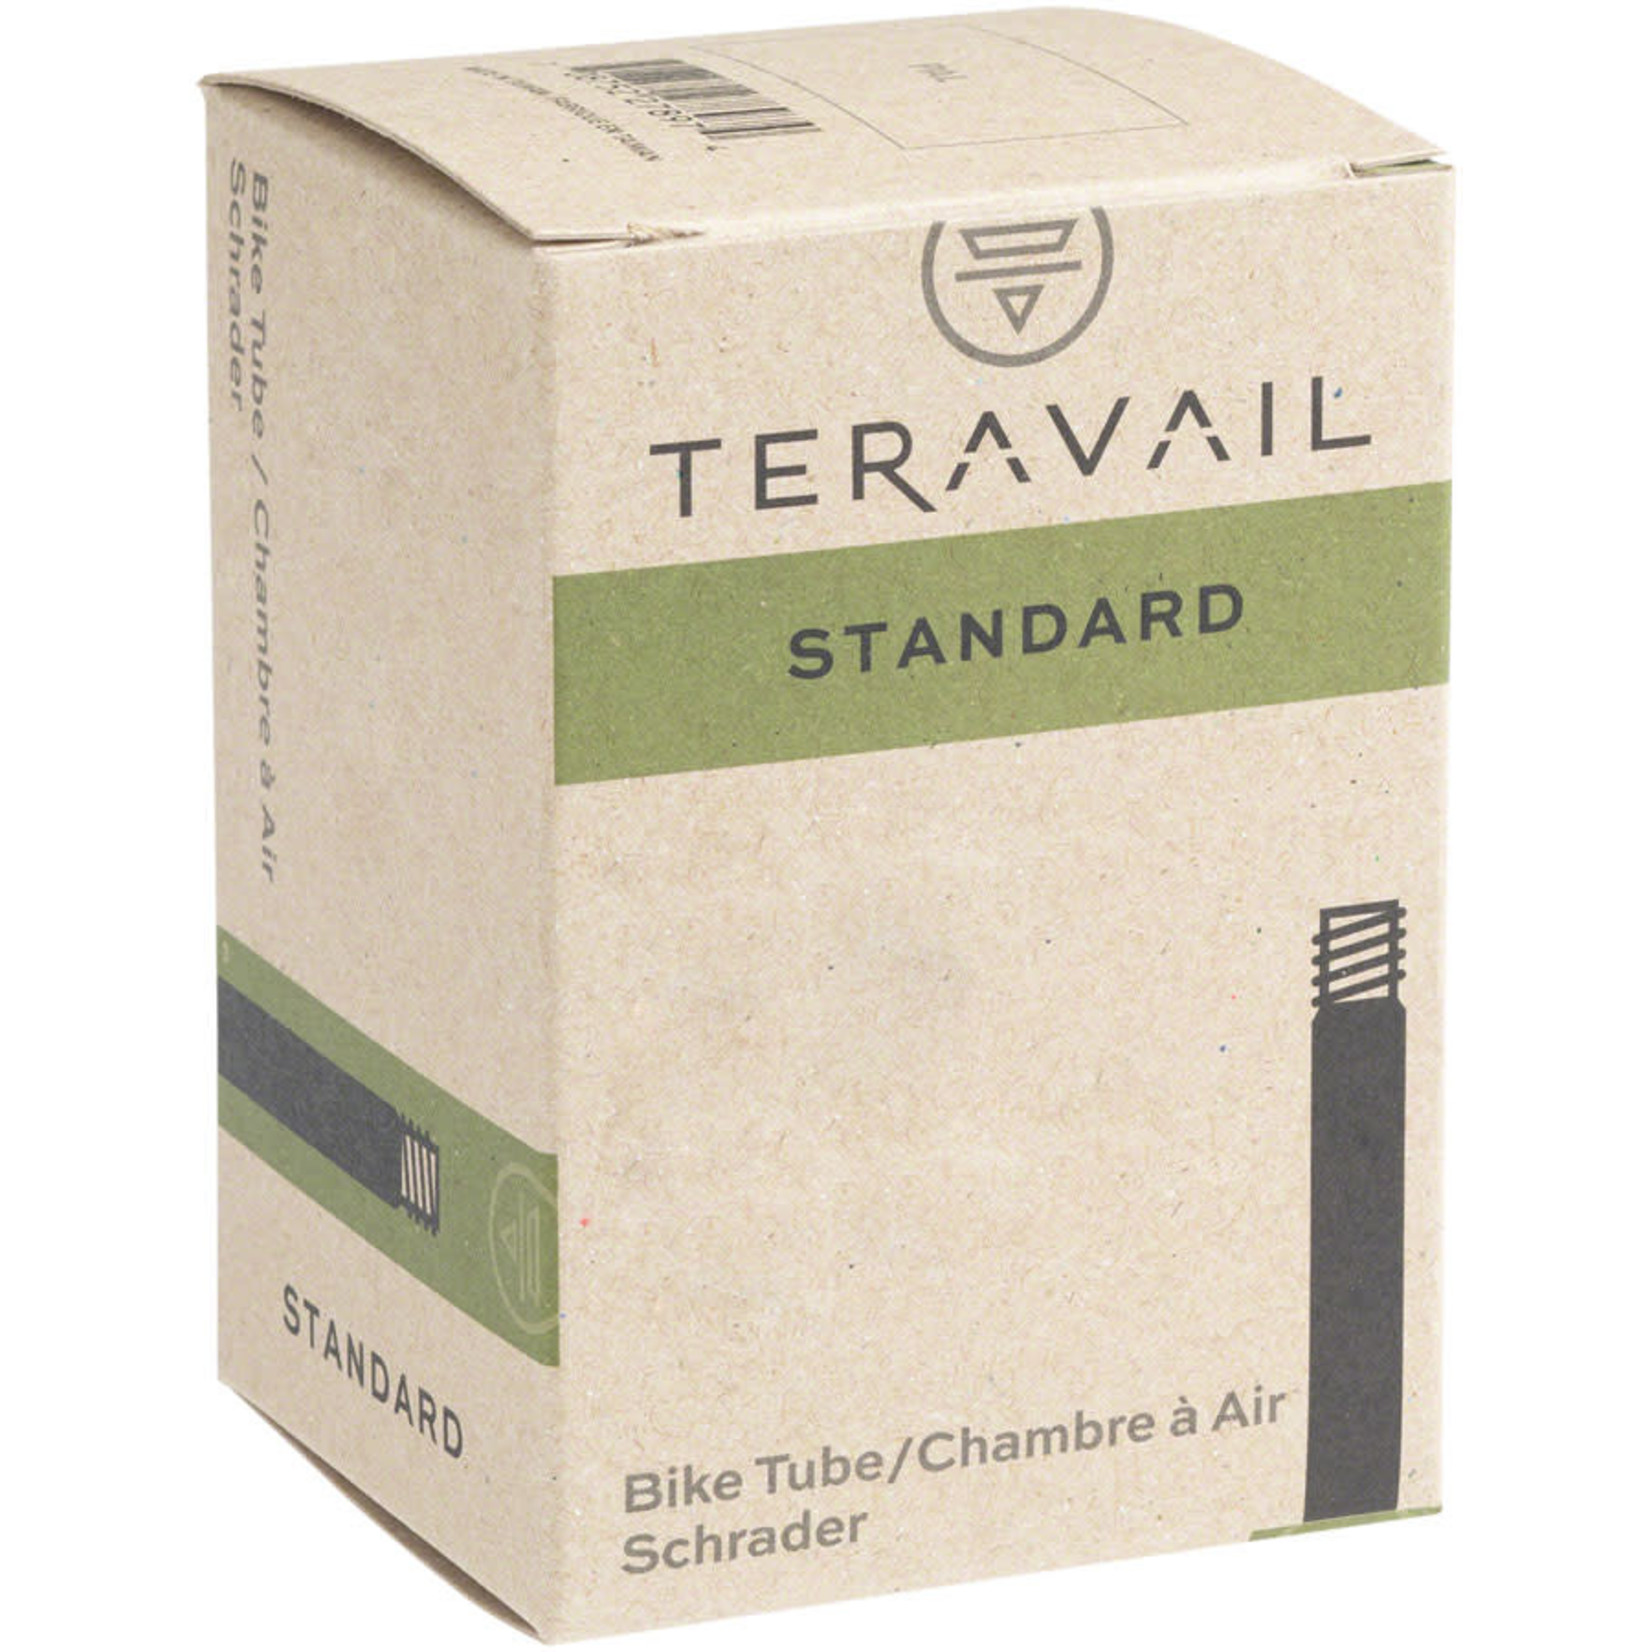 "Q-Tubes Q-Tubes / Teravail 700c x 28-32mm Schrader Valve Tube 128g (27 x 1-1/4"")"